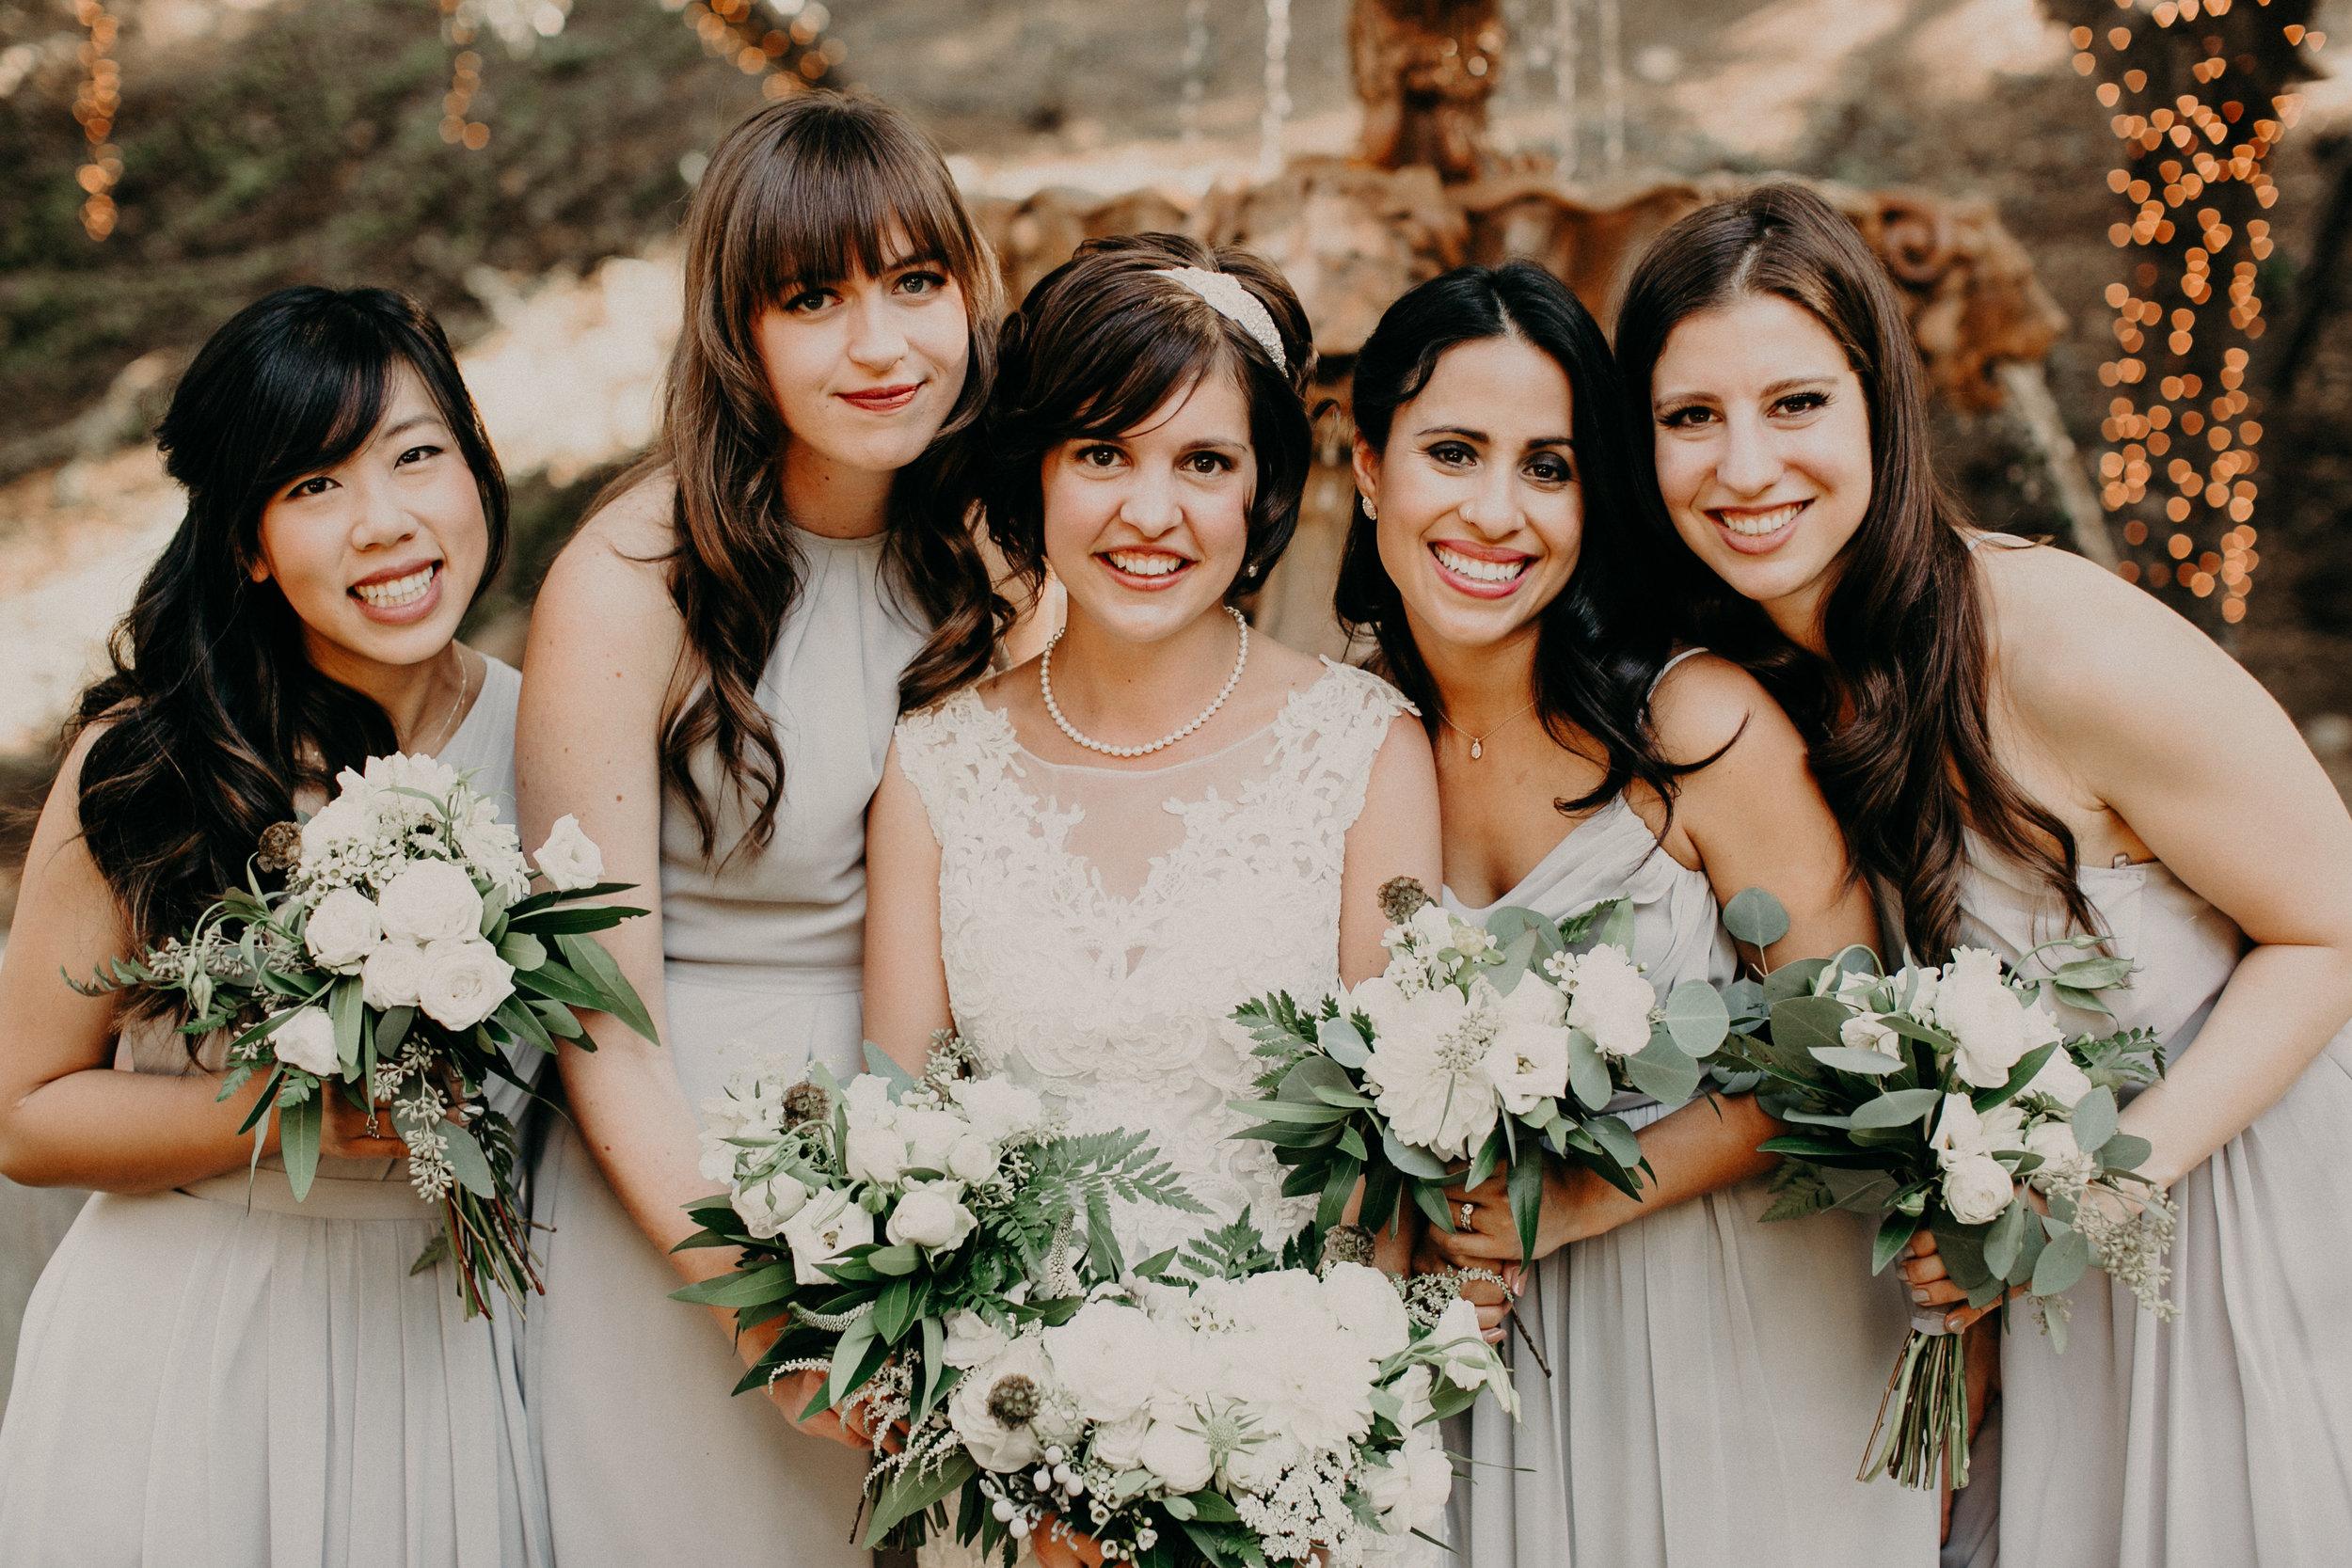 Bridal PartyBridesmaidesgroomsmen-0316.jpg